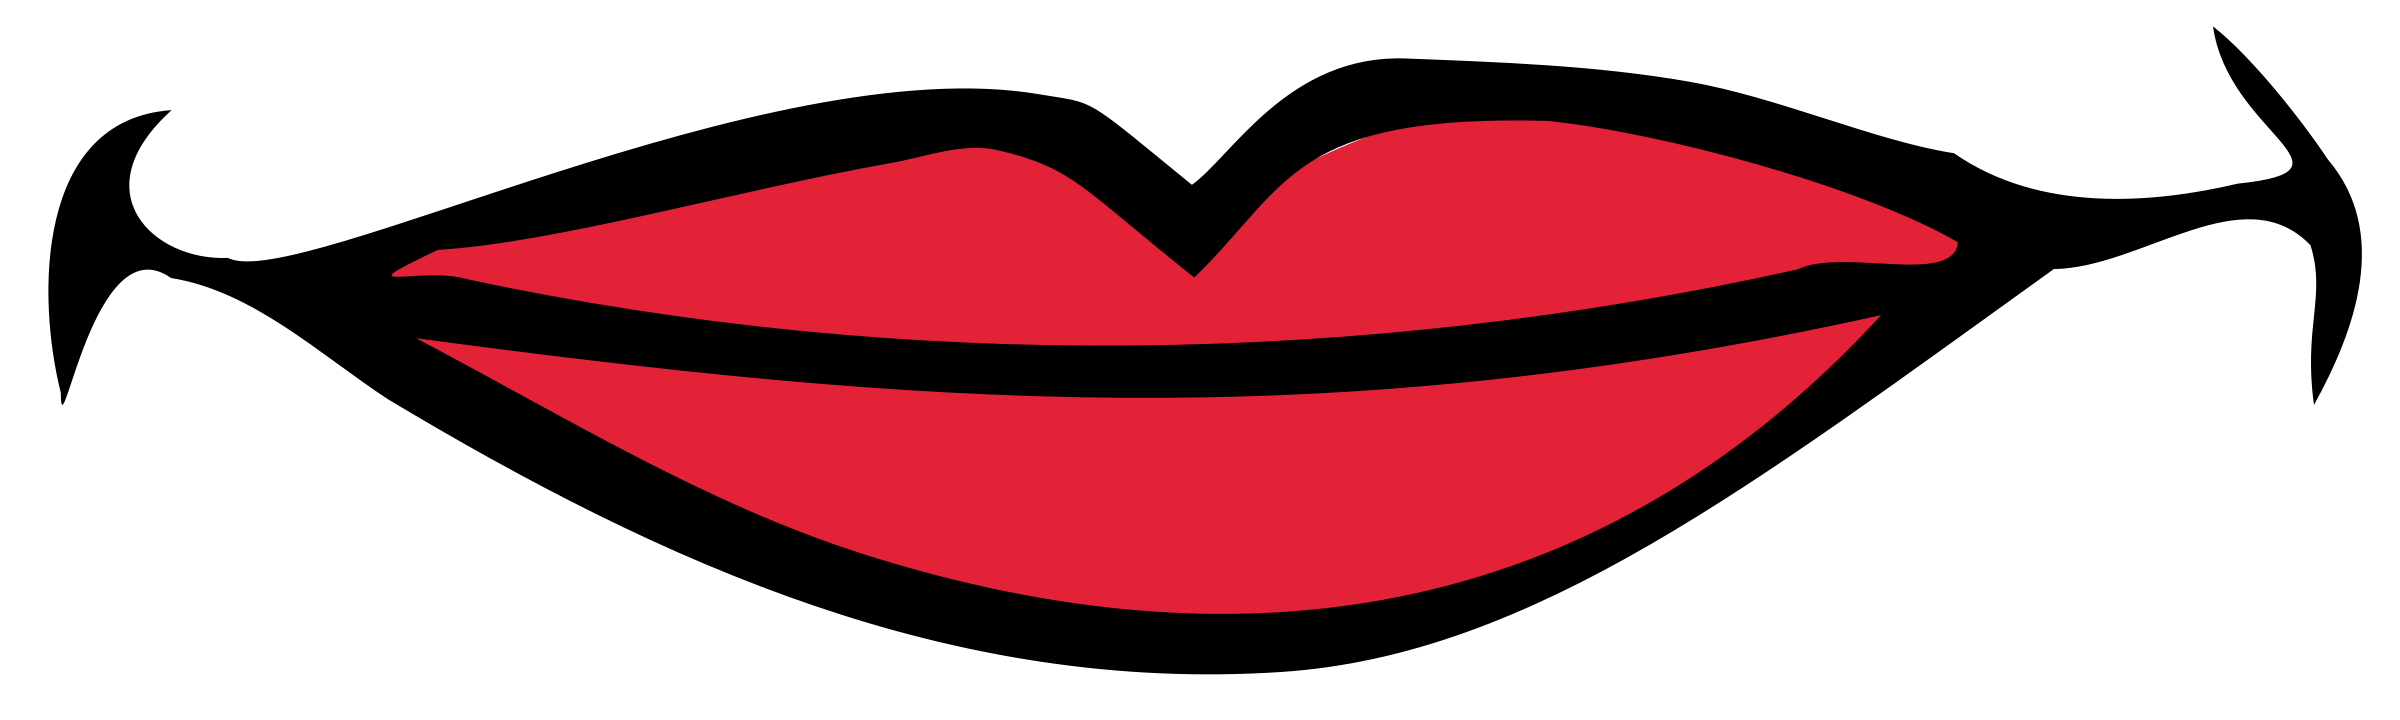 Quiet lips clip art. Lip clipart silent